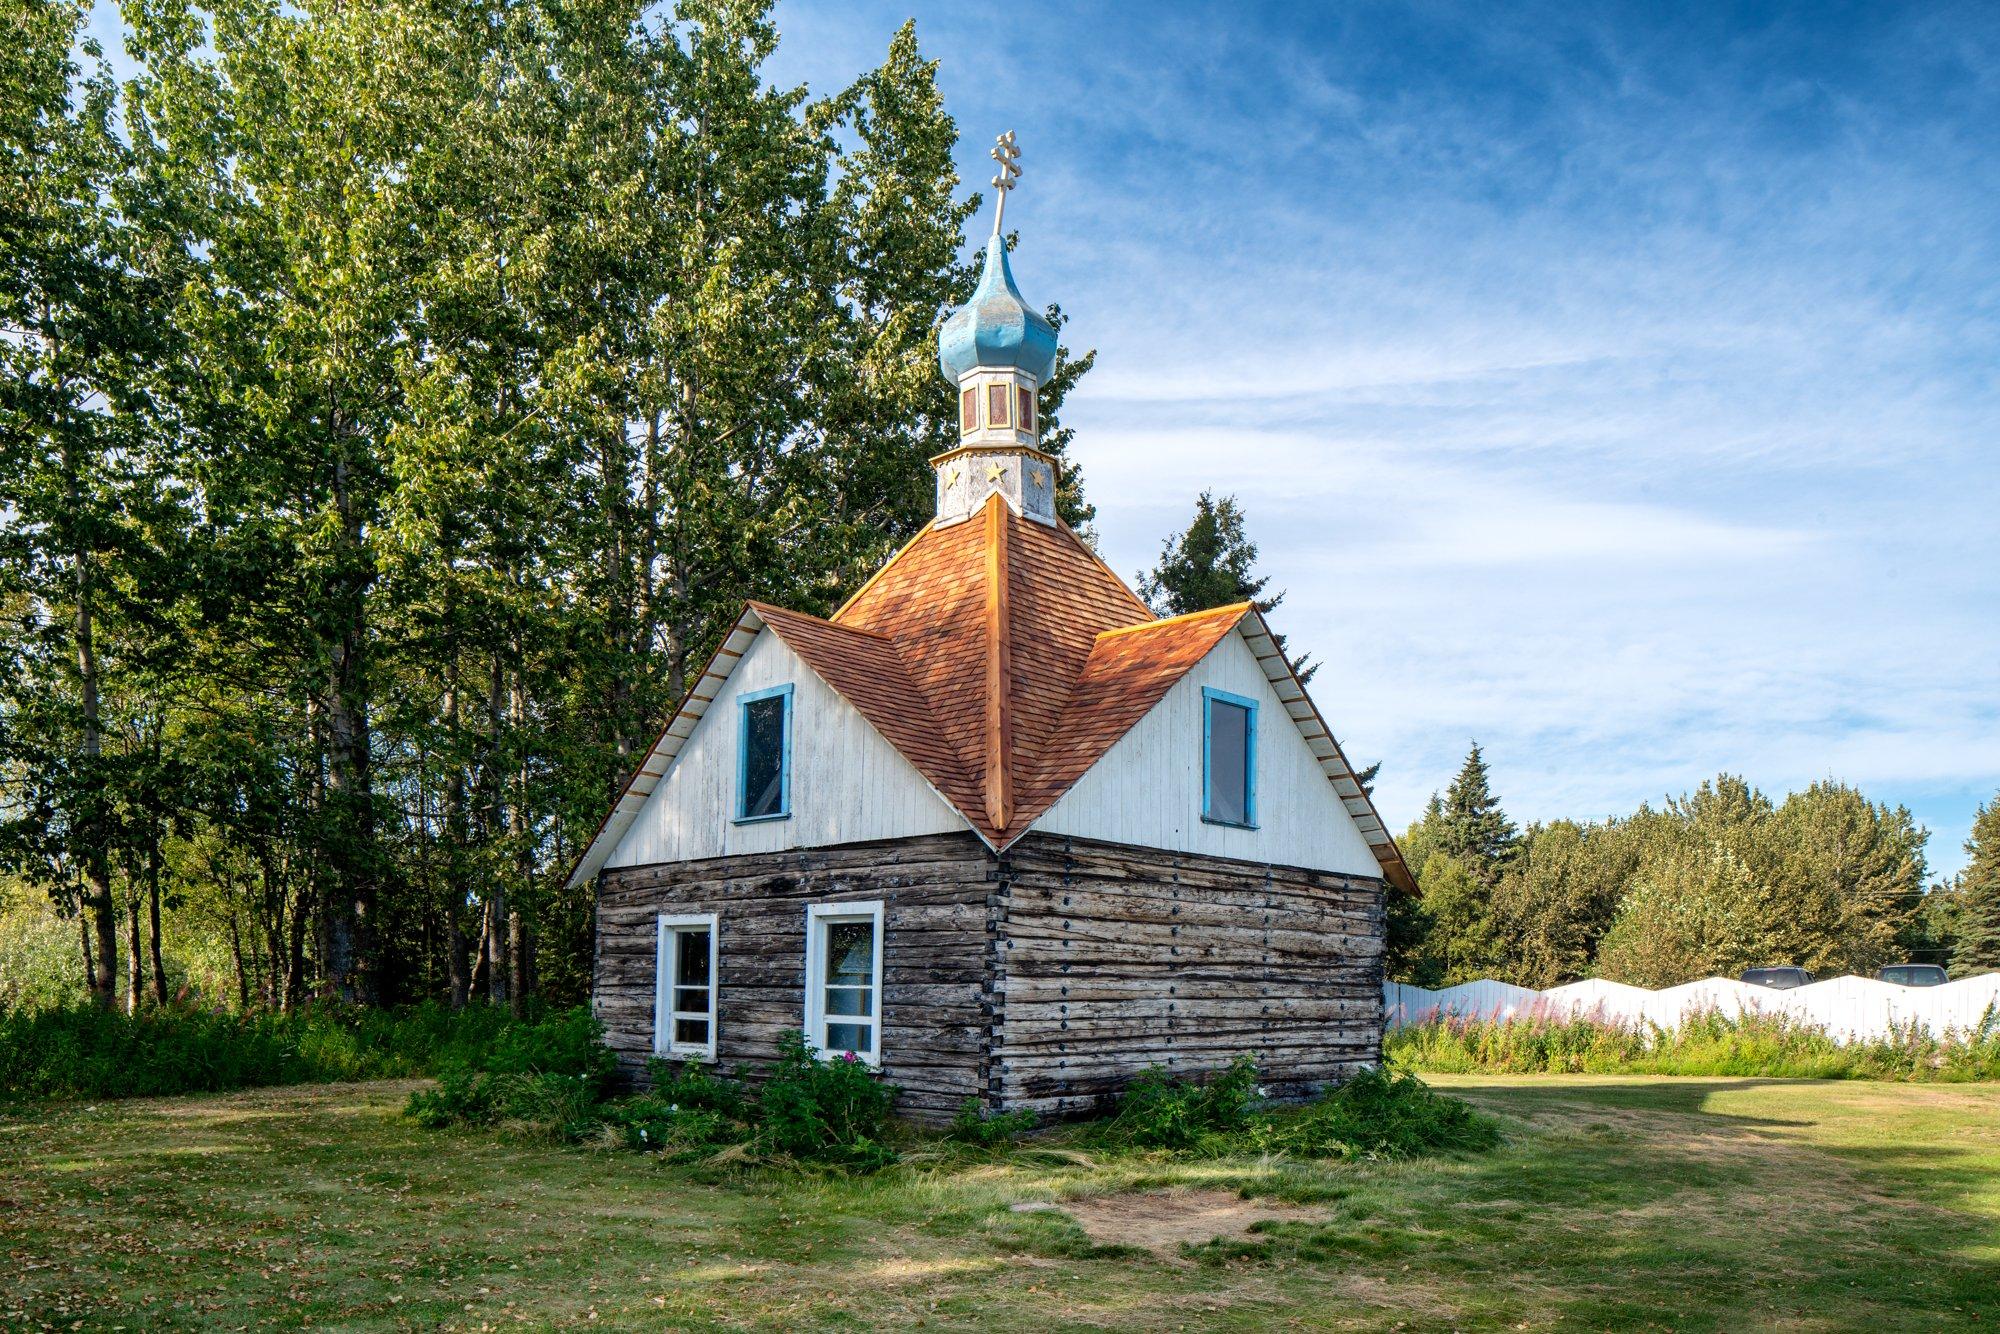 Chapel St. Nicholas 1906 Kenai Alaska Color Print Photograph Rural Rustic Architecture Church Frontier Travel